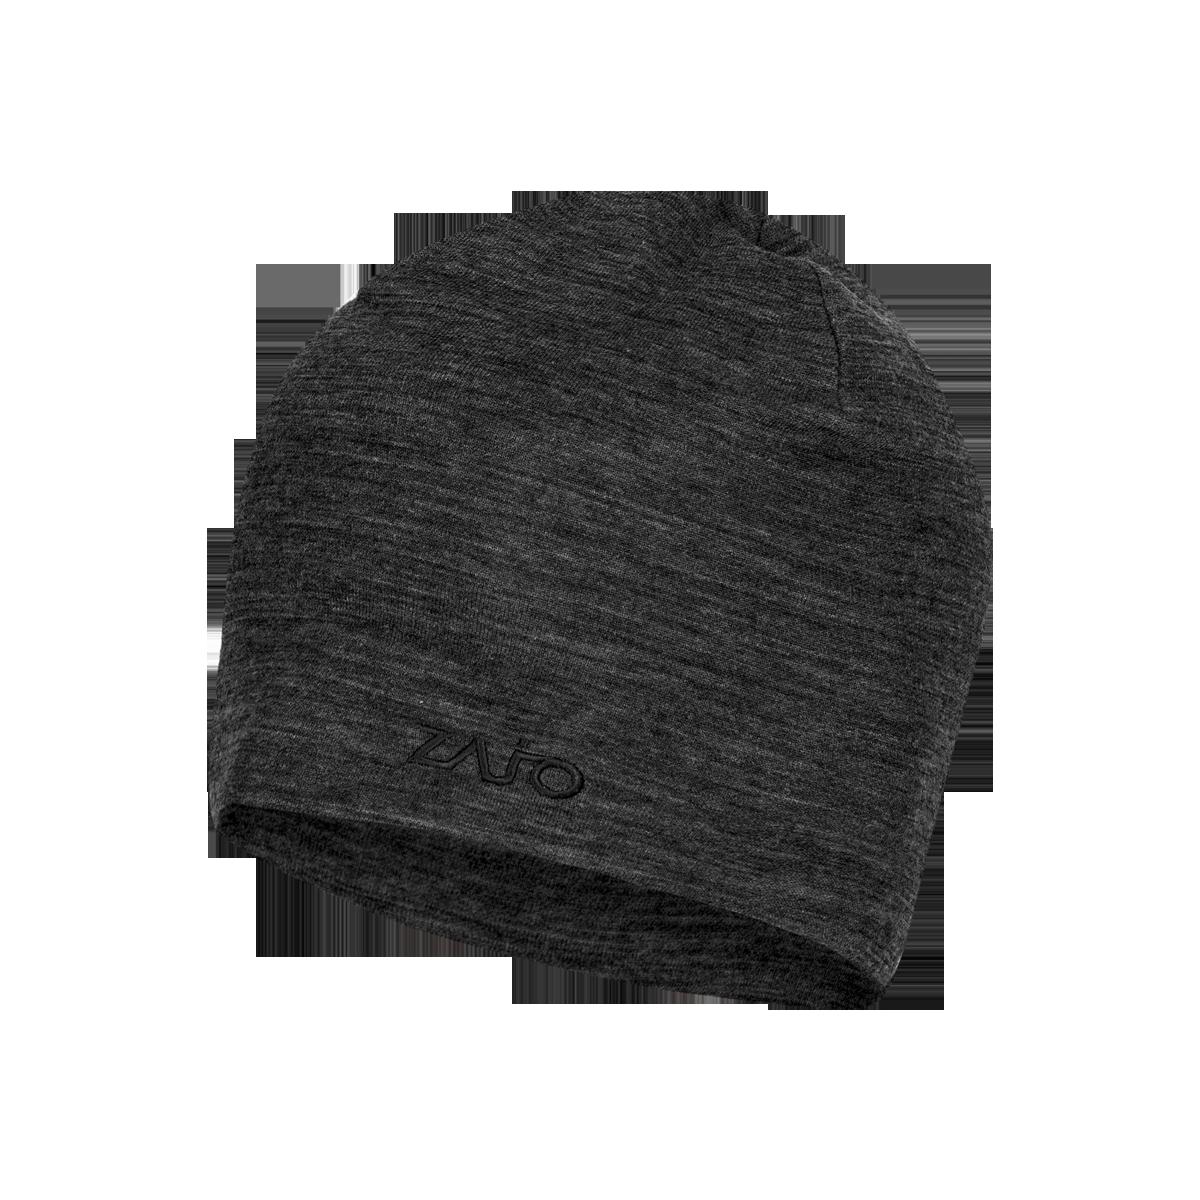 Caciula din lana merino si bambus ZAJO Hals Typo – Negru de la proalpin.ro